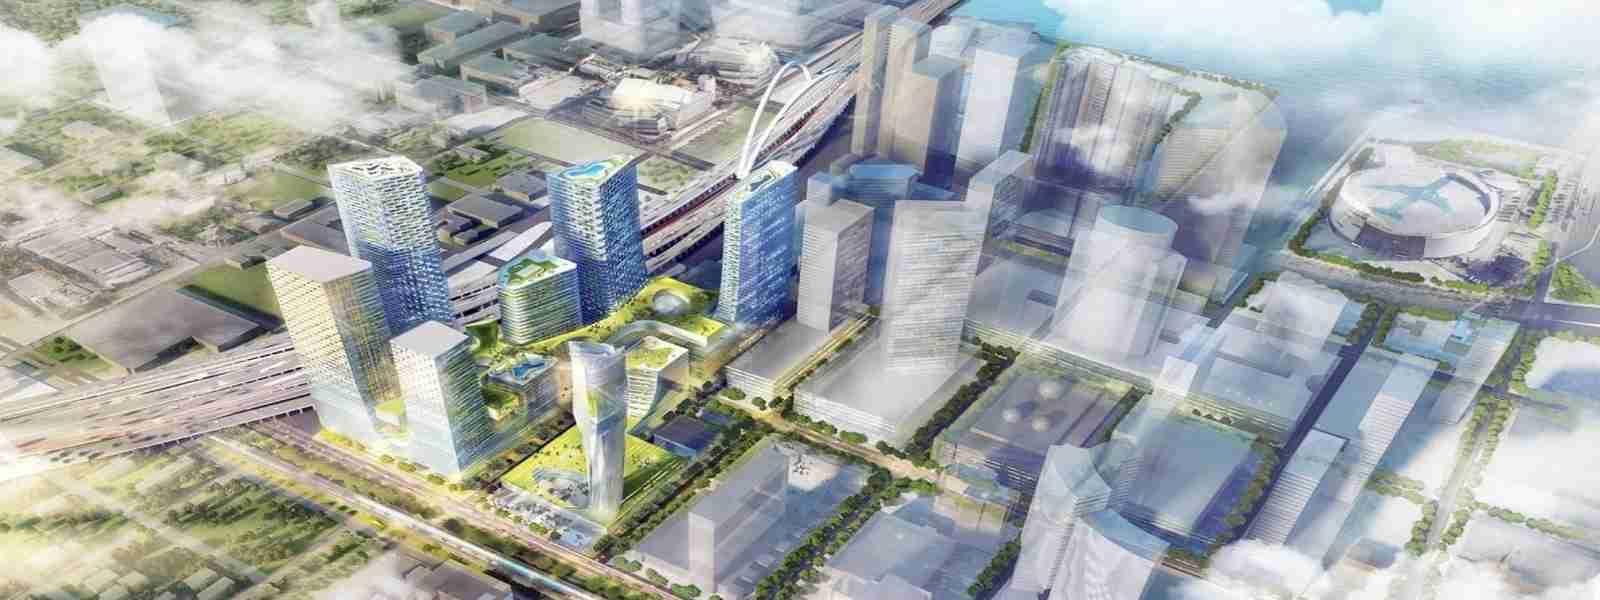 Miami Innovation District Idea Gaining Tech Community